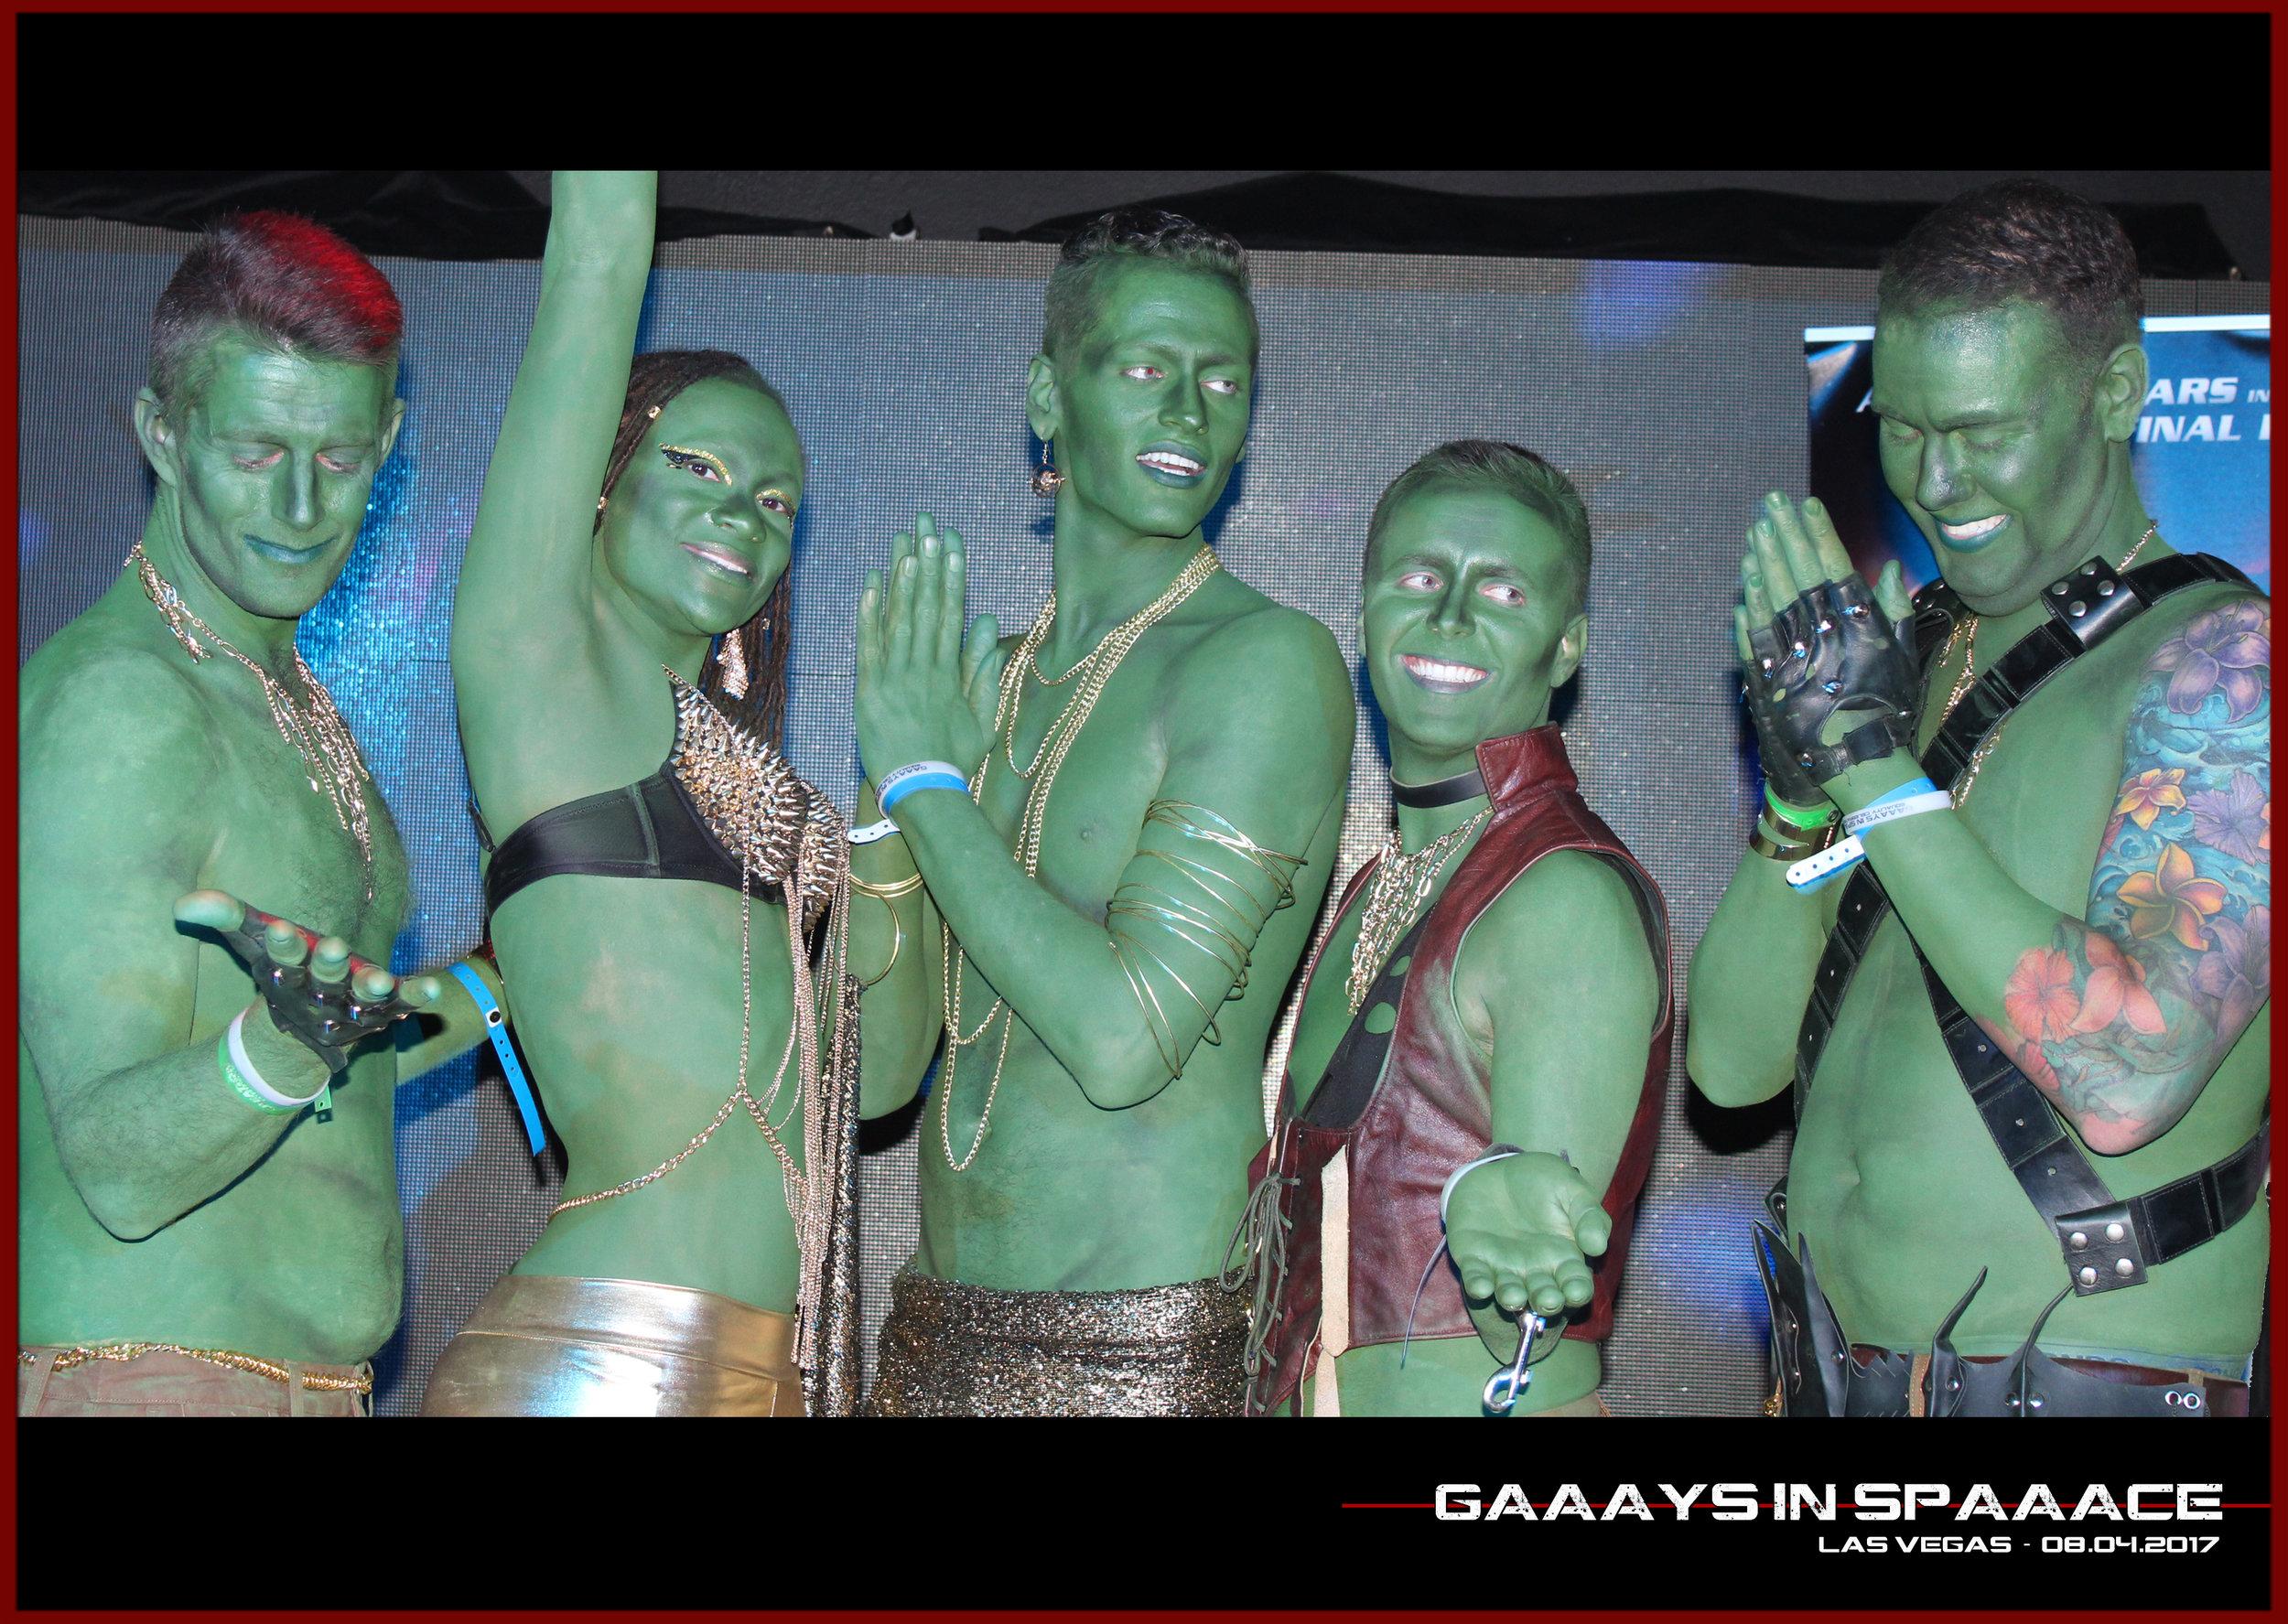 54-GIS-VEGAS-8-4-17-TheOrionSlaveBoys-on-Stage.jpg